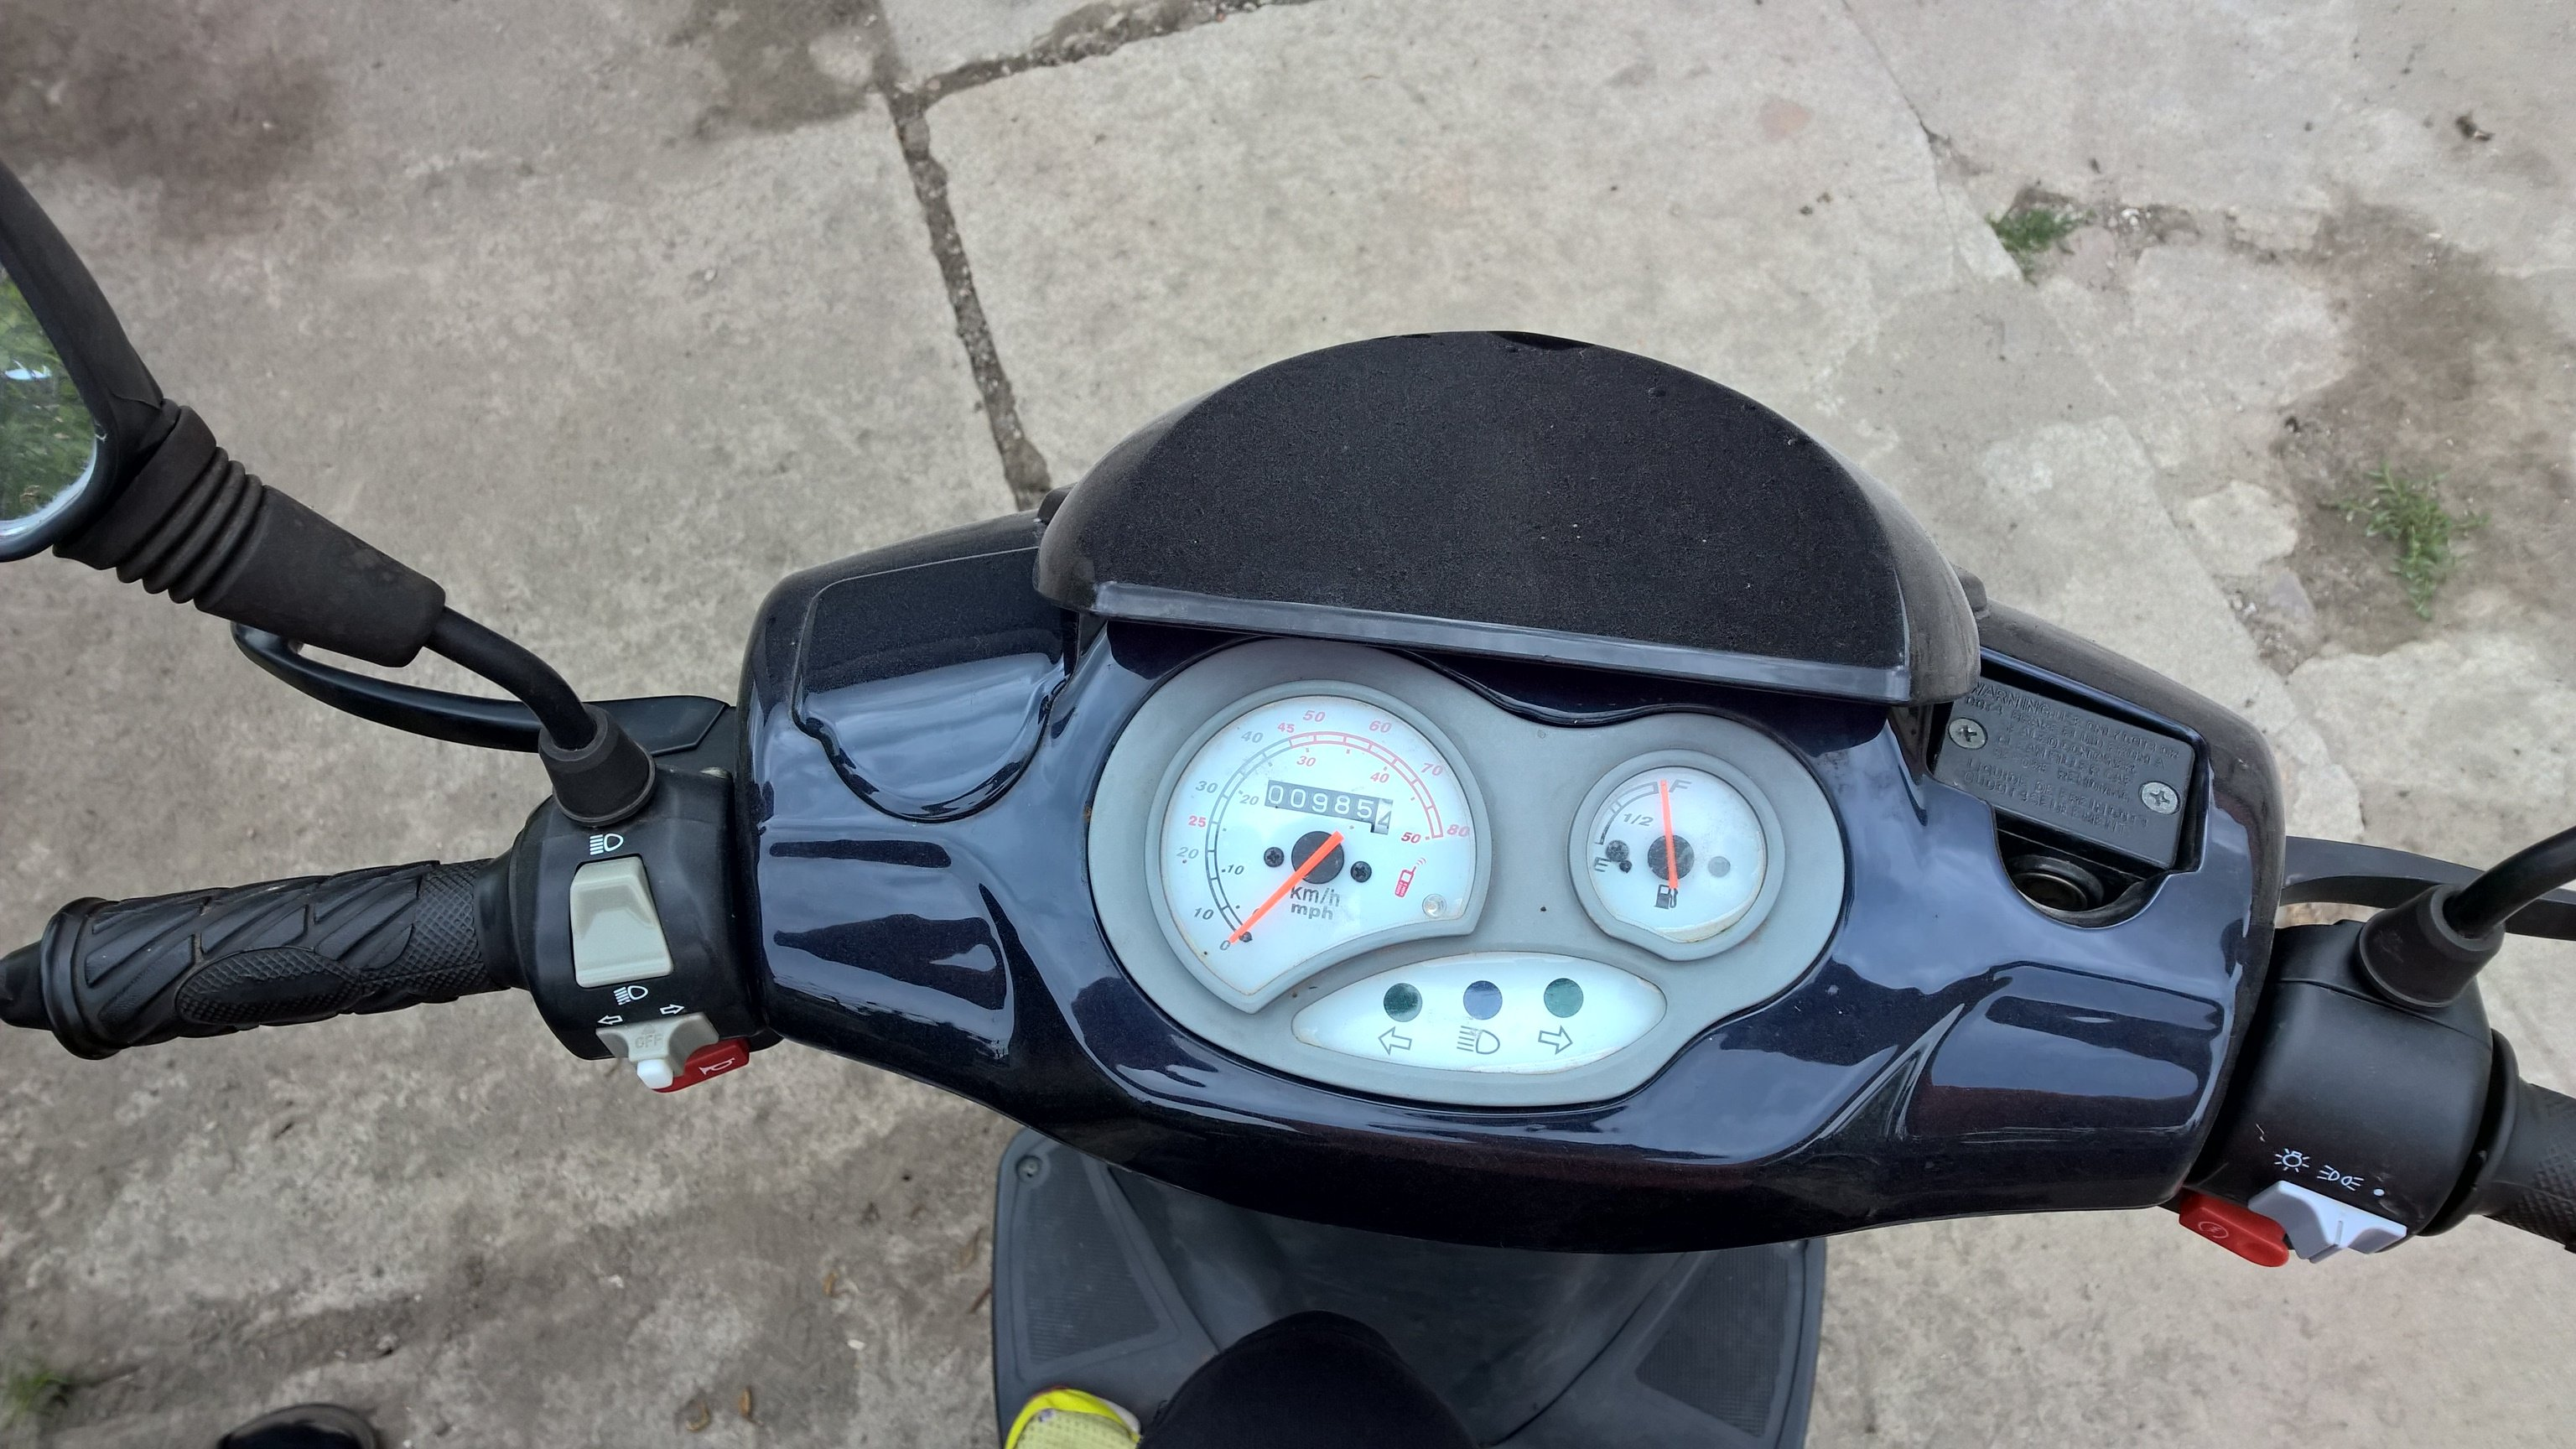 Sprzedam skuter motorower